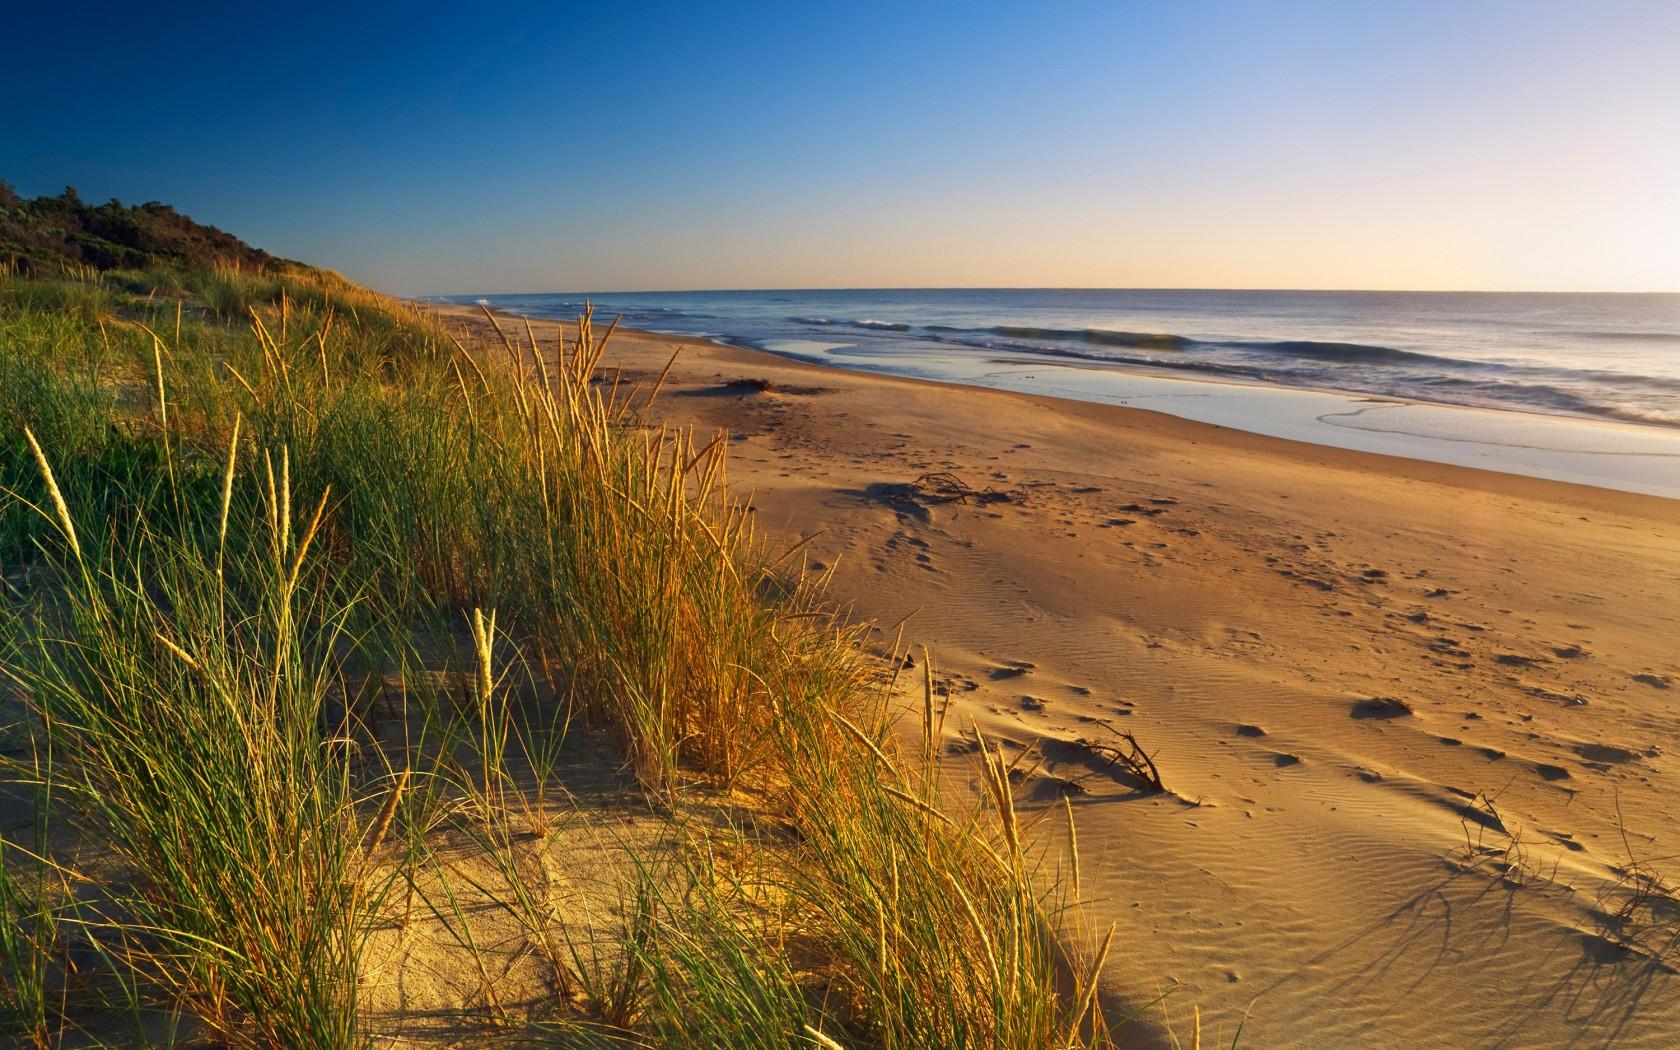 Edited-17.90-Miles-Beach-Australia-B51PMW-1680x1050